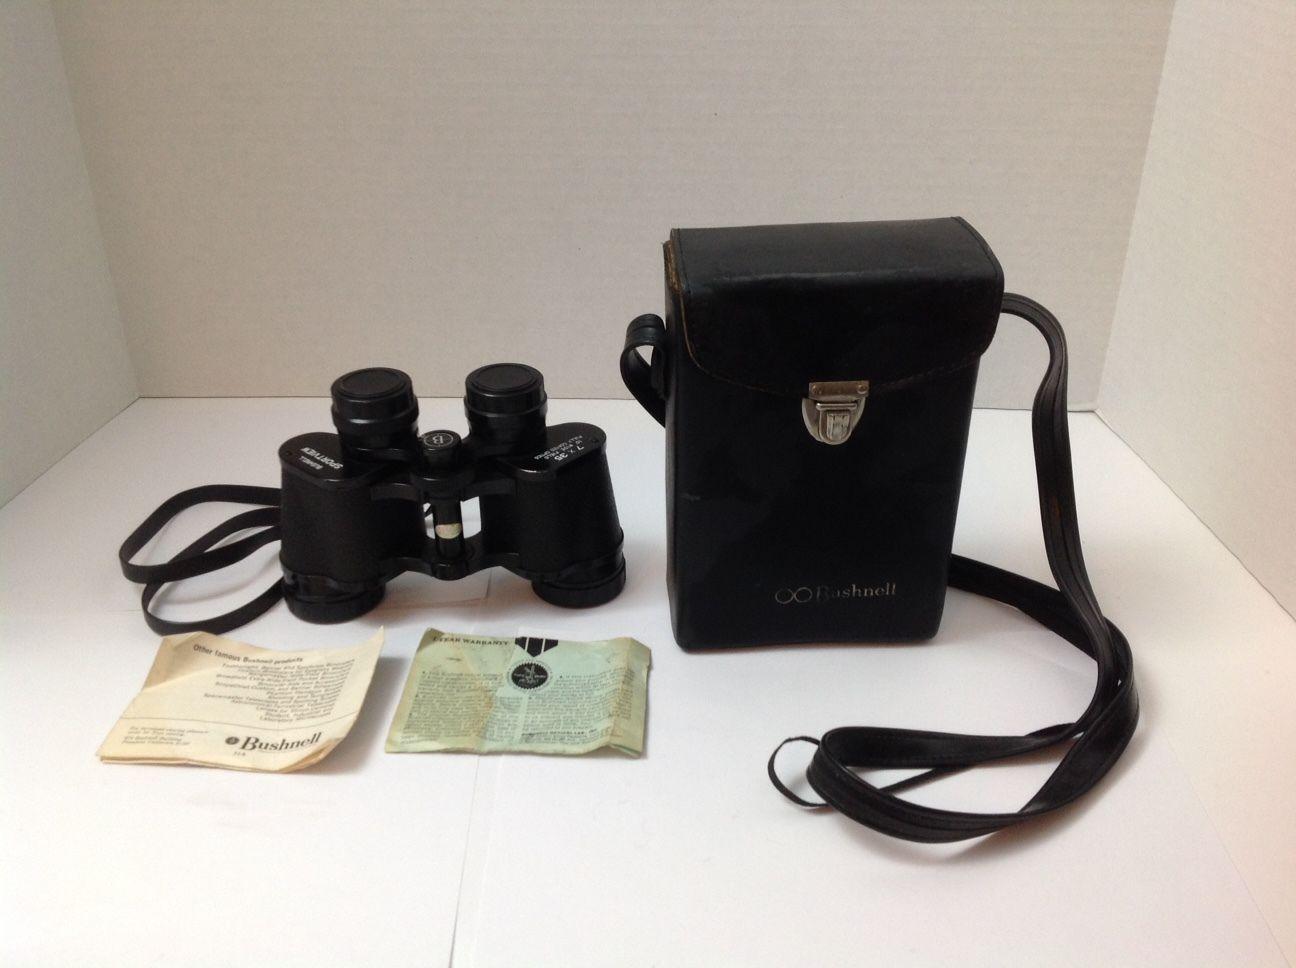 Vintage 1970s BUSHNELL Sportview Binoculars 7 x 35 Fully Coated Optics w/ Case